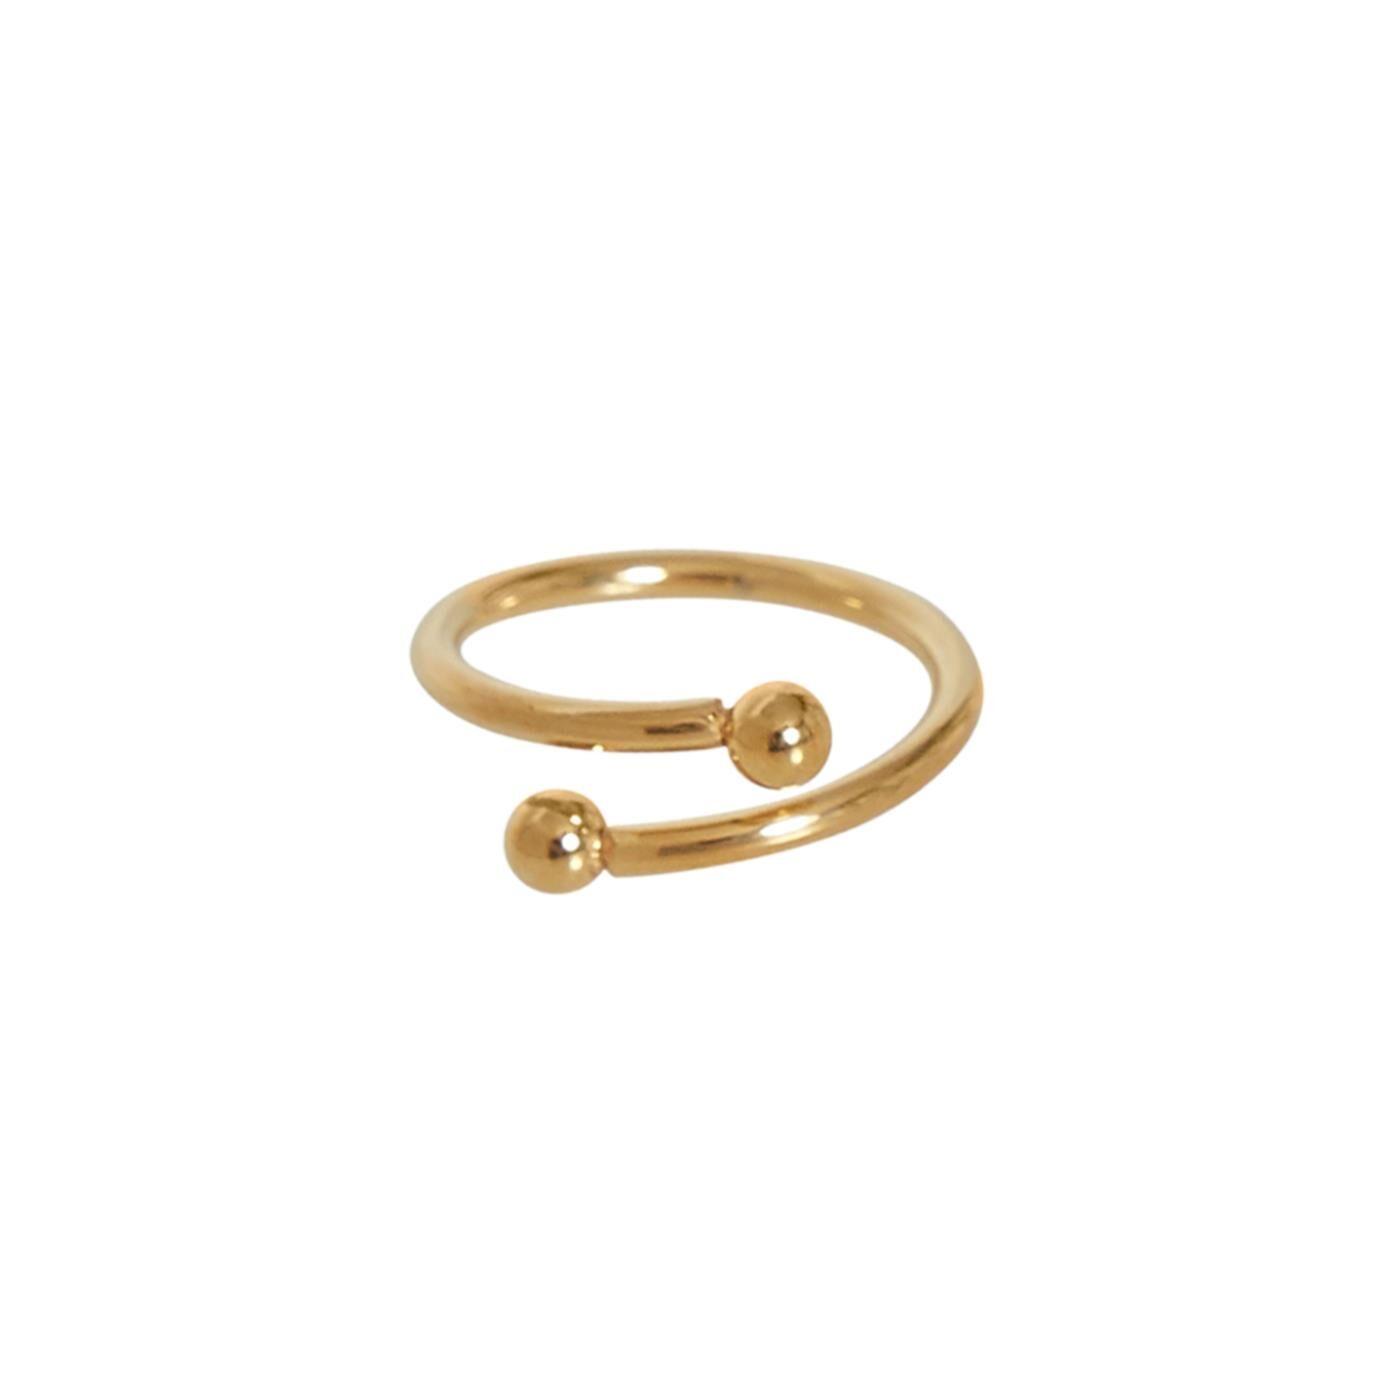 Celestino Ρυθμιζόμενο δαχτυλίδι  - Χρυσαφι - Grootte: 19